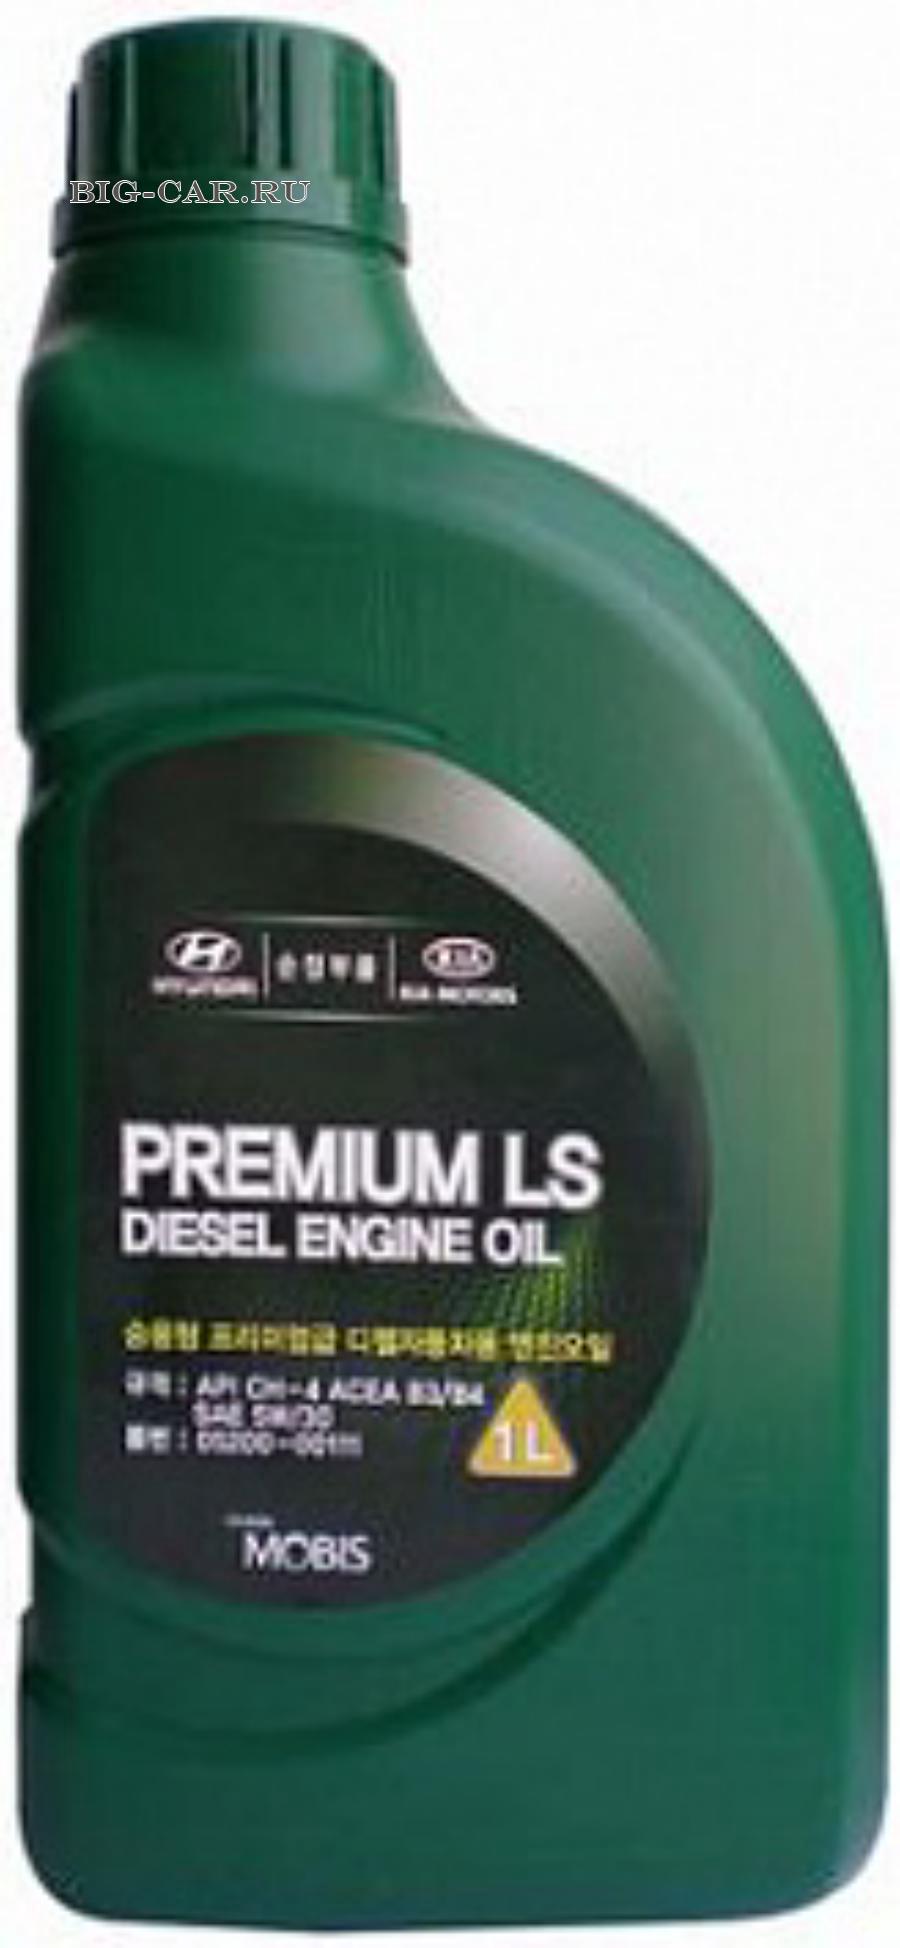 Масло моторное полусинтетическое Premium LS Diesel 5W-30, 1л